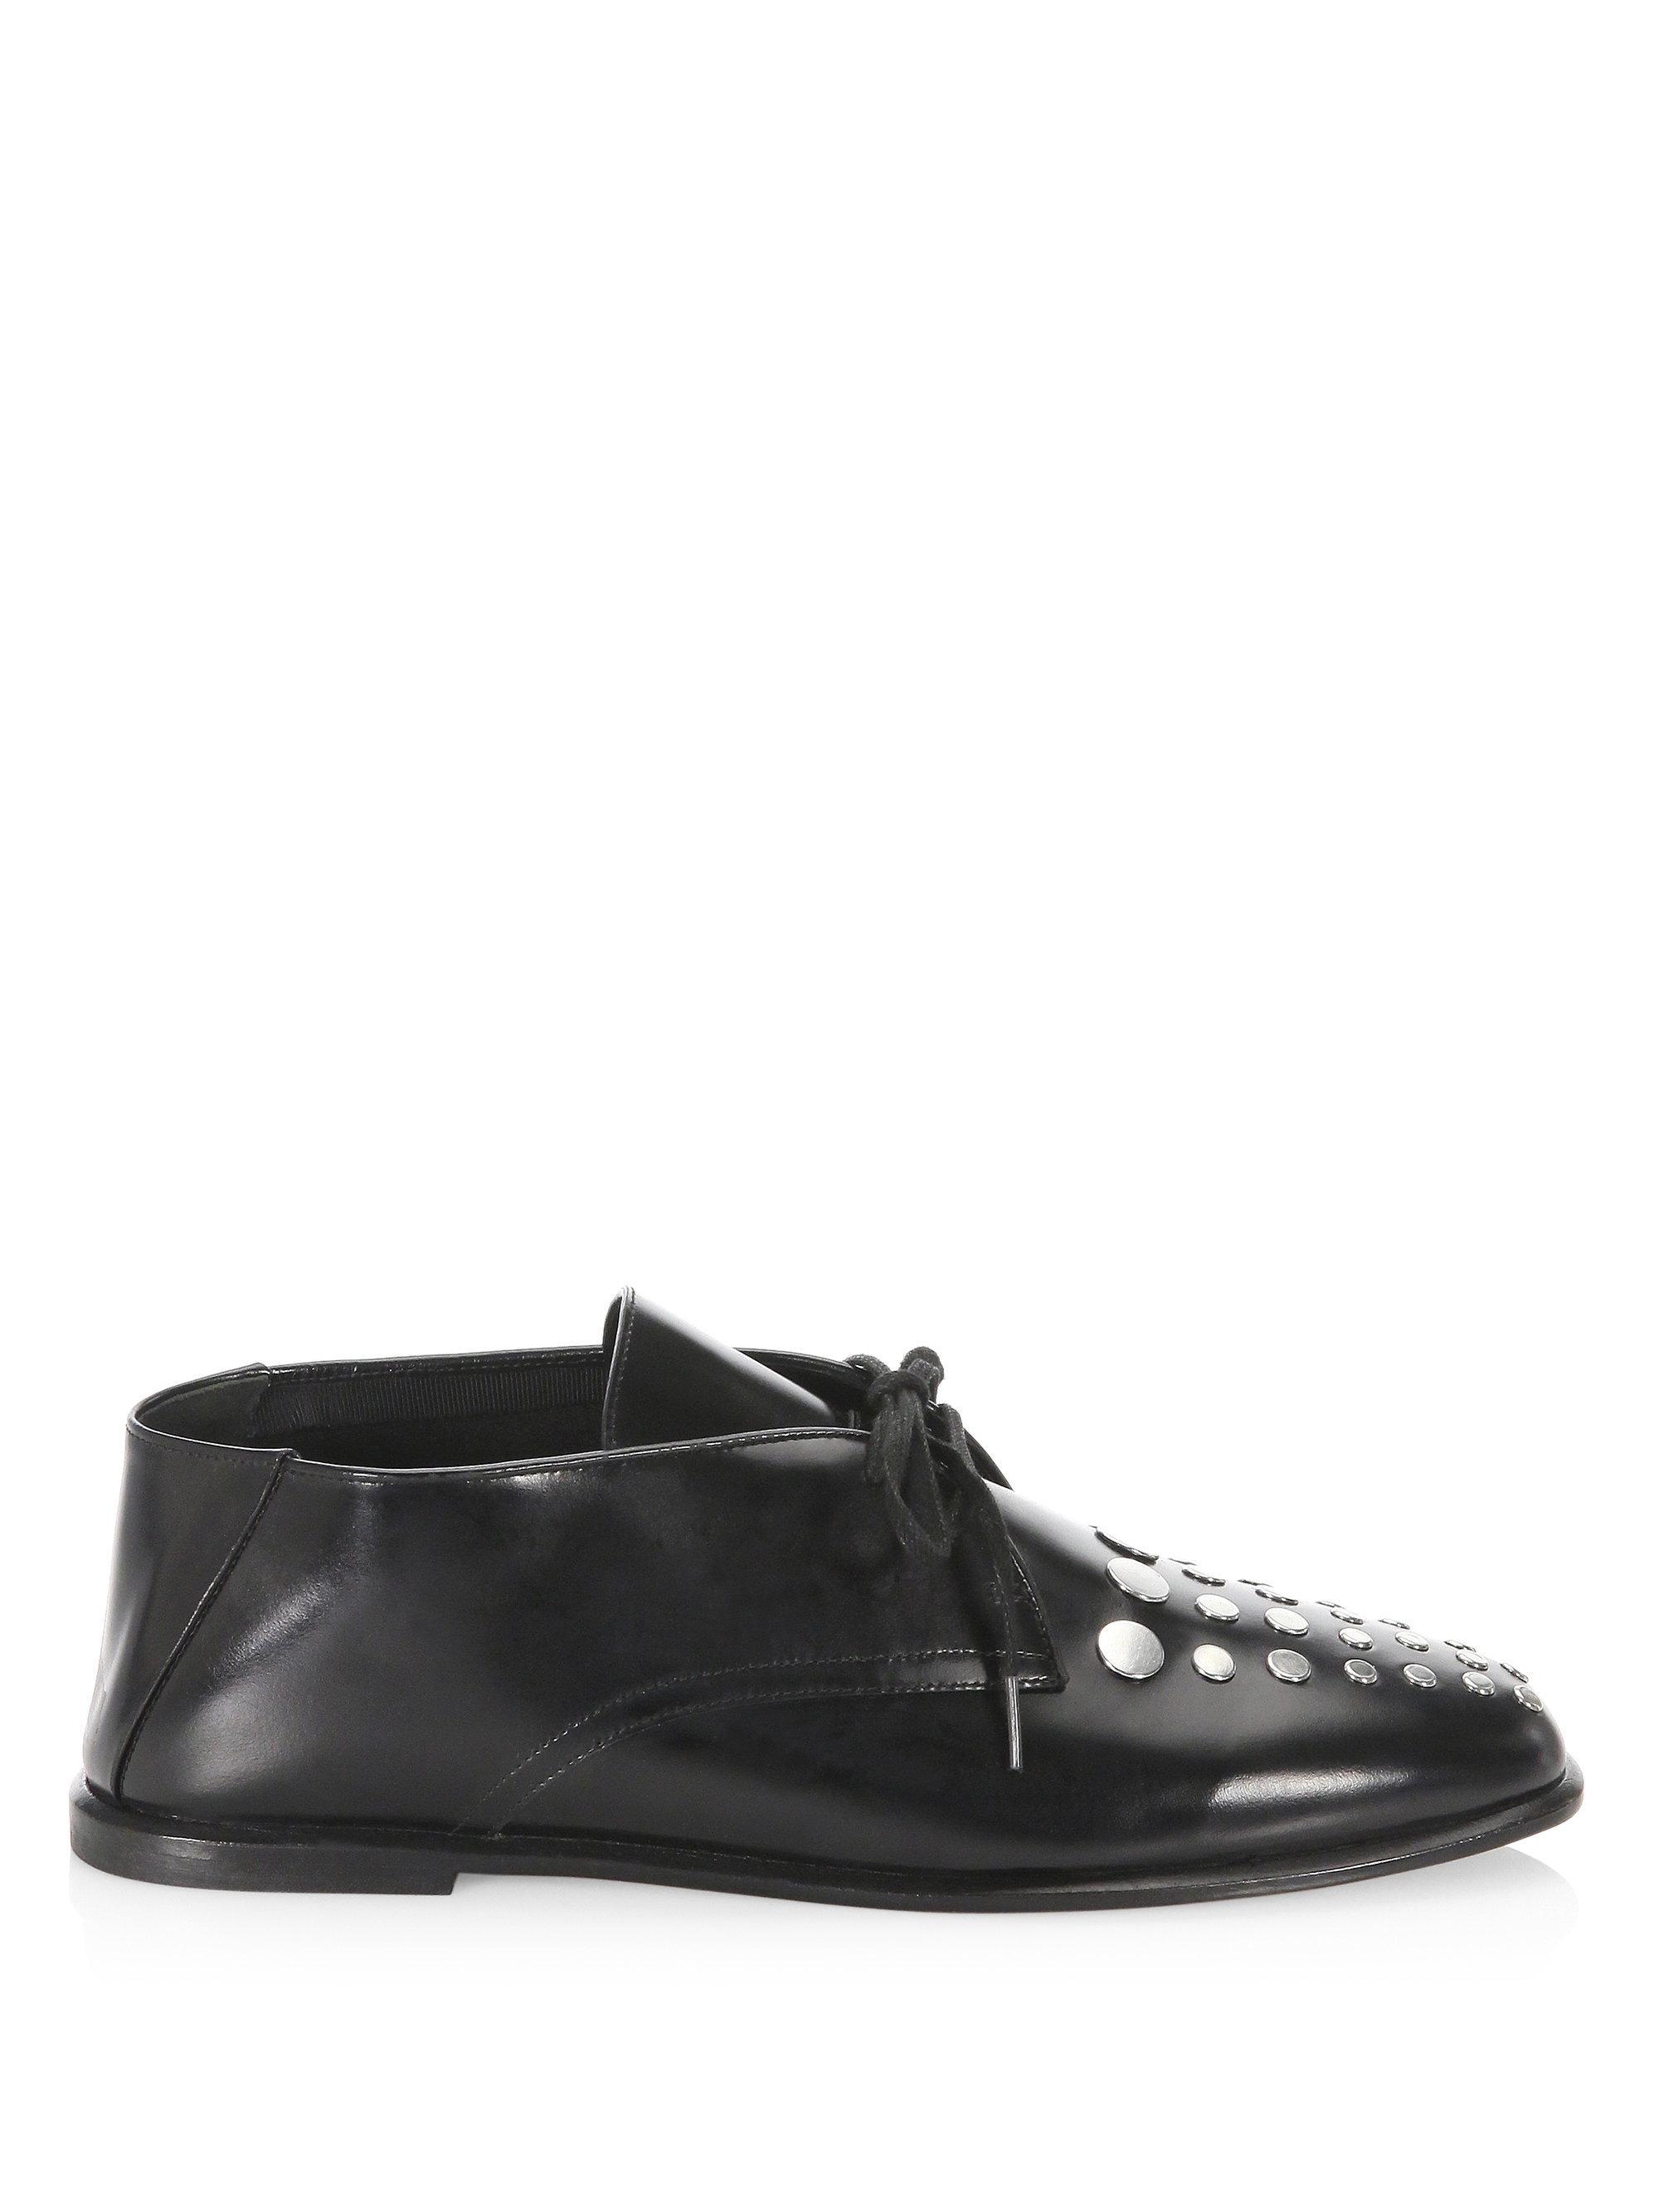 Alexander Wang Camy Leather Derbys